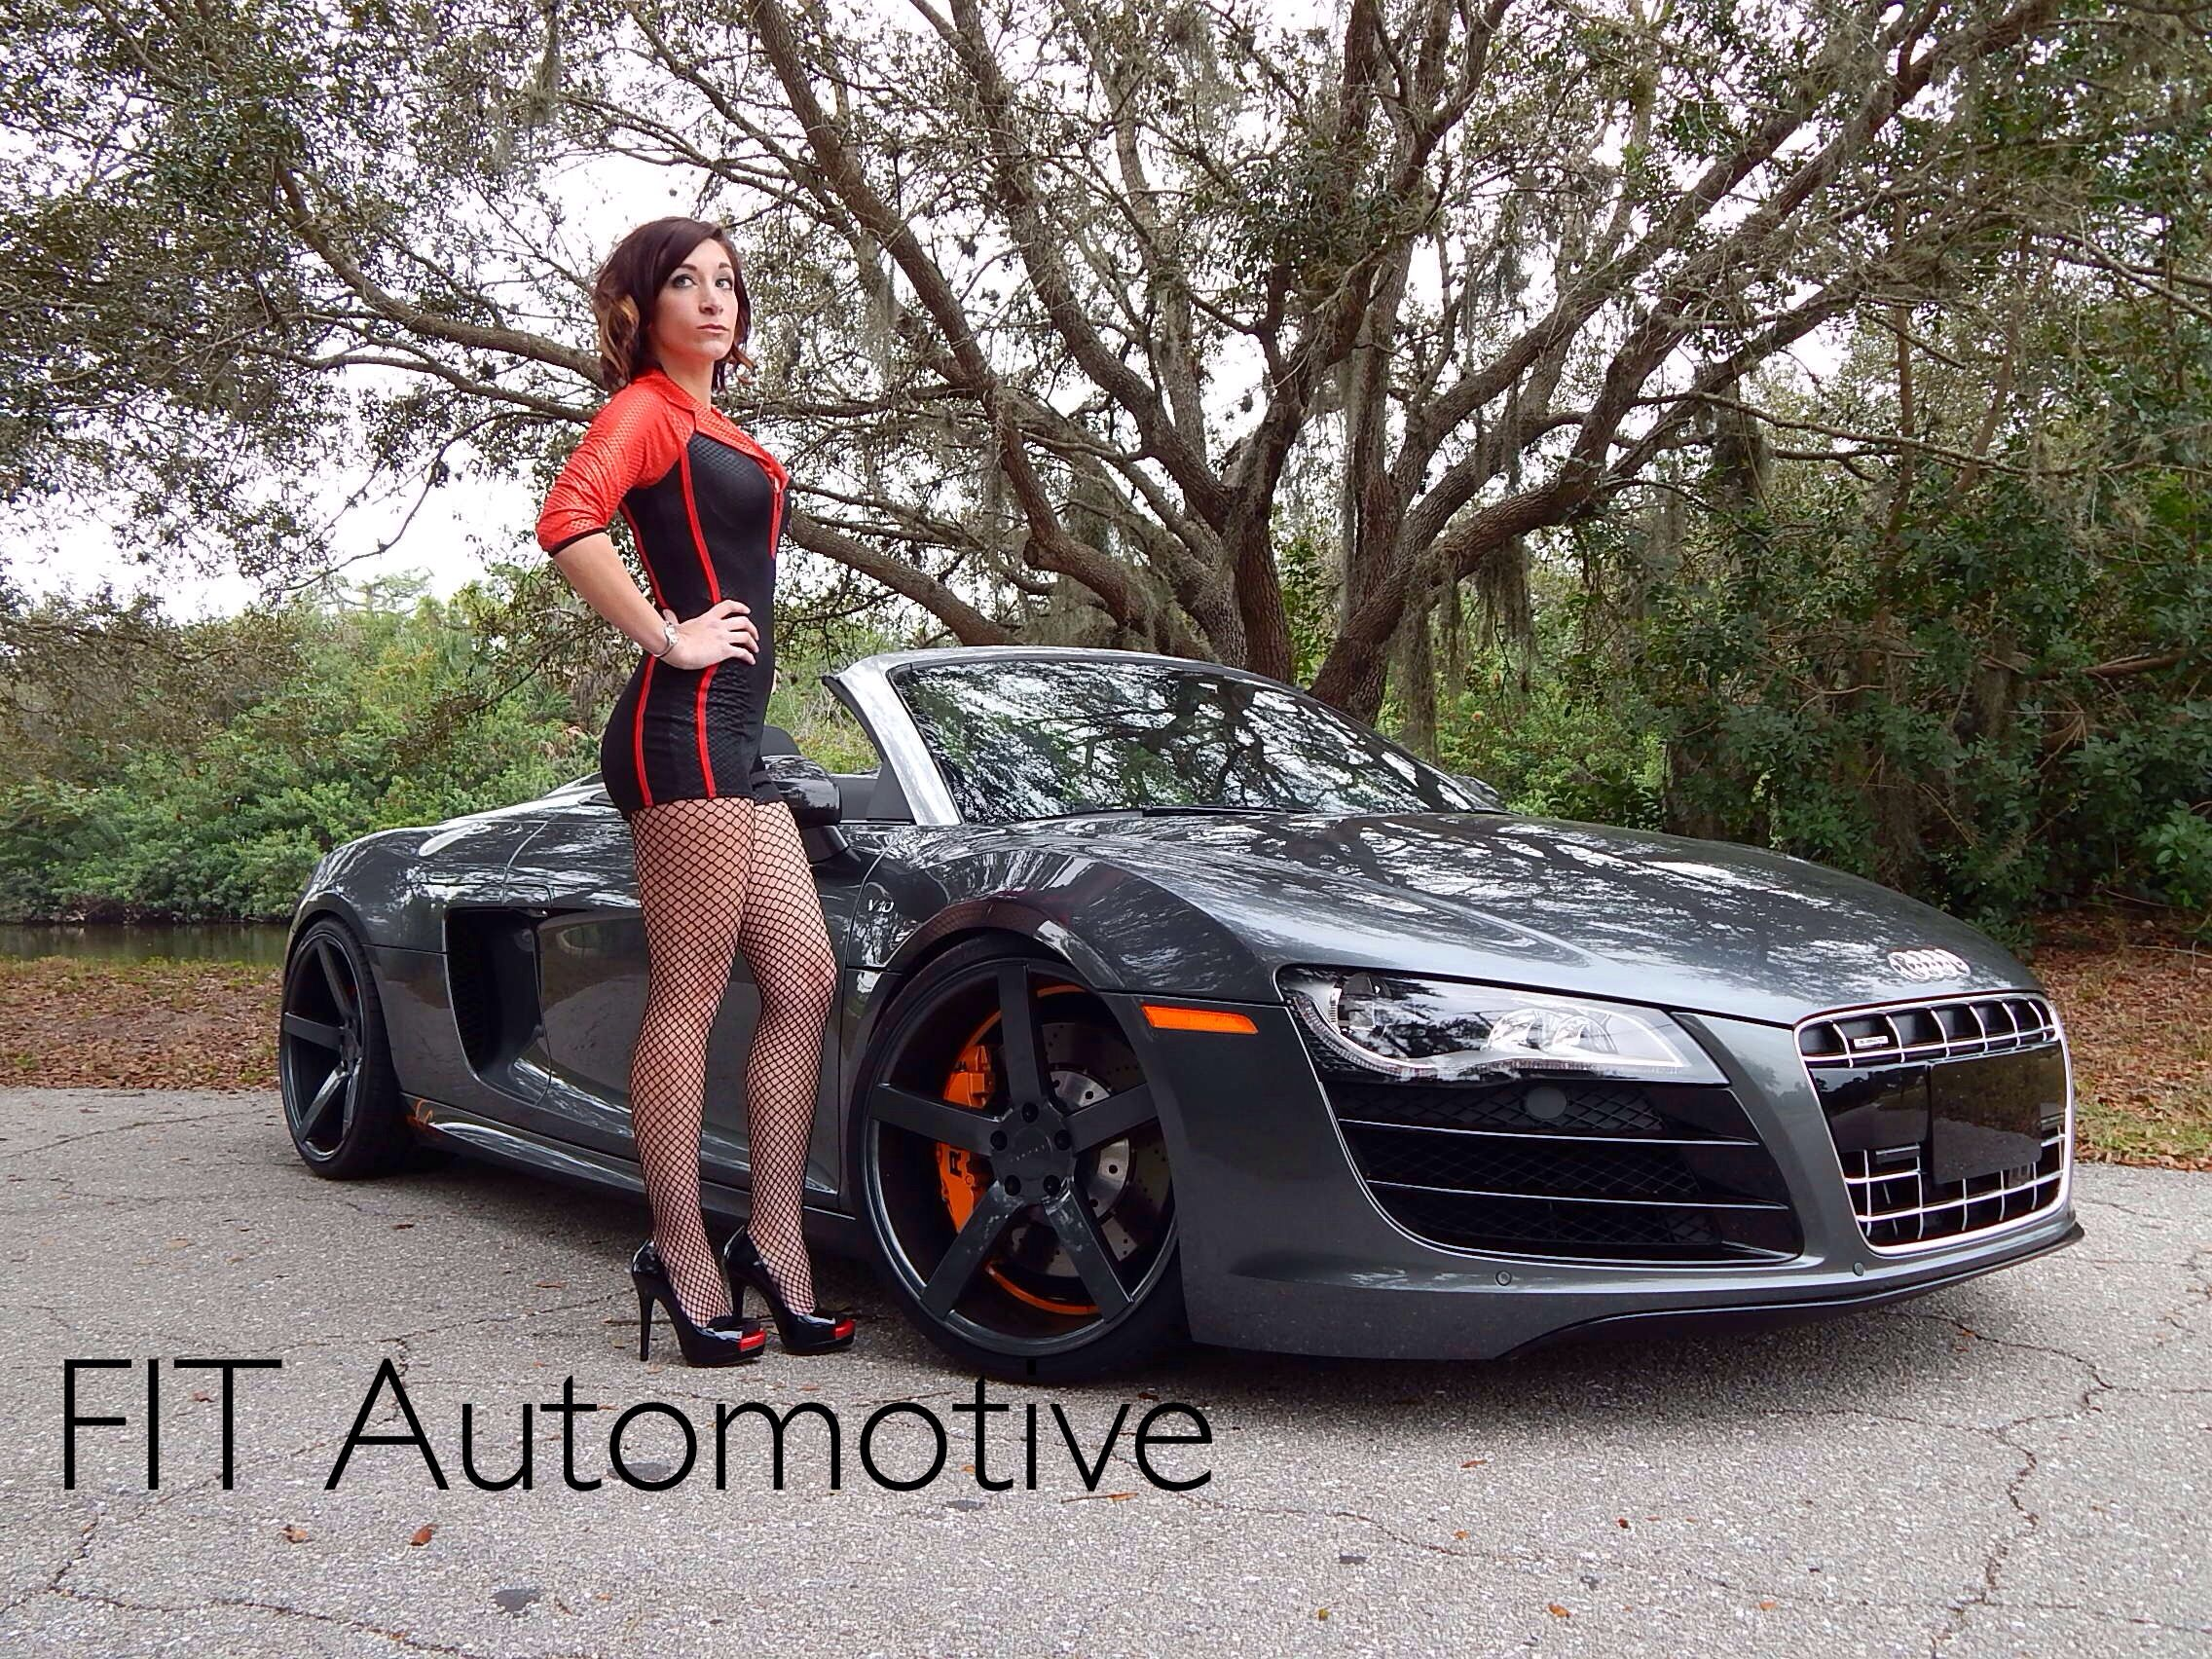 Cars And Girls. #hotgirl #car #audi #audir8 #fastcars #carmodel